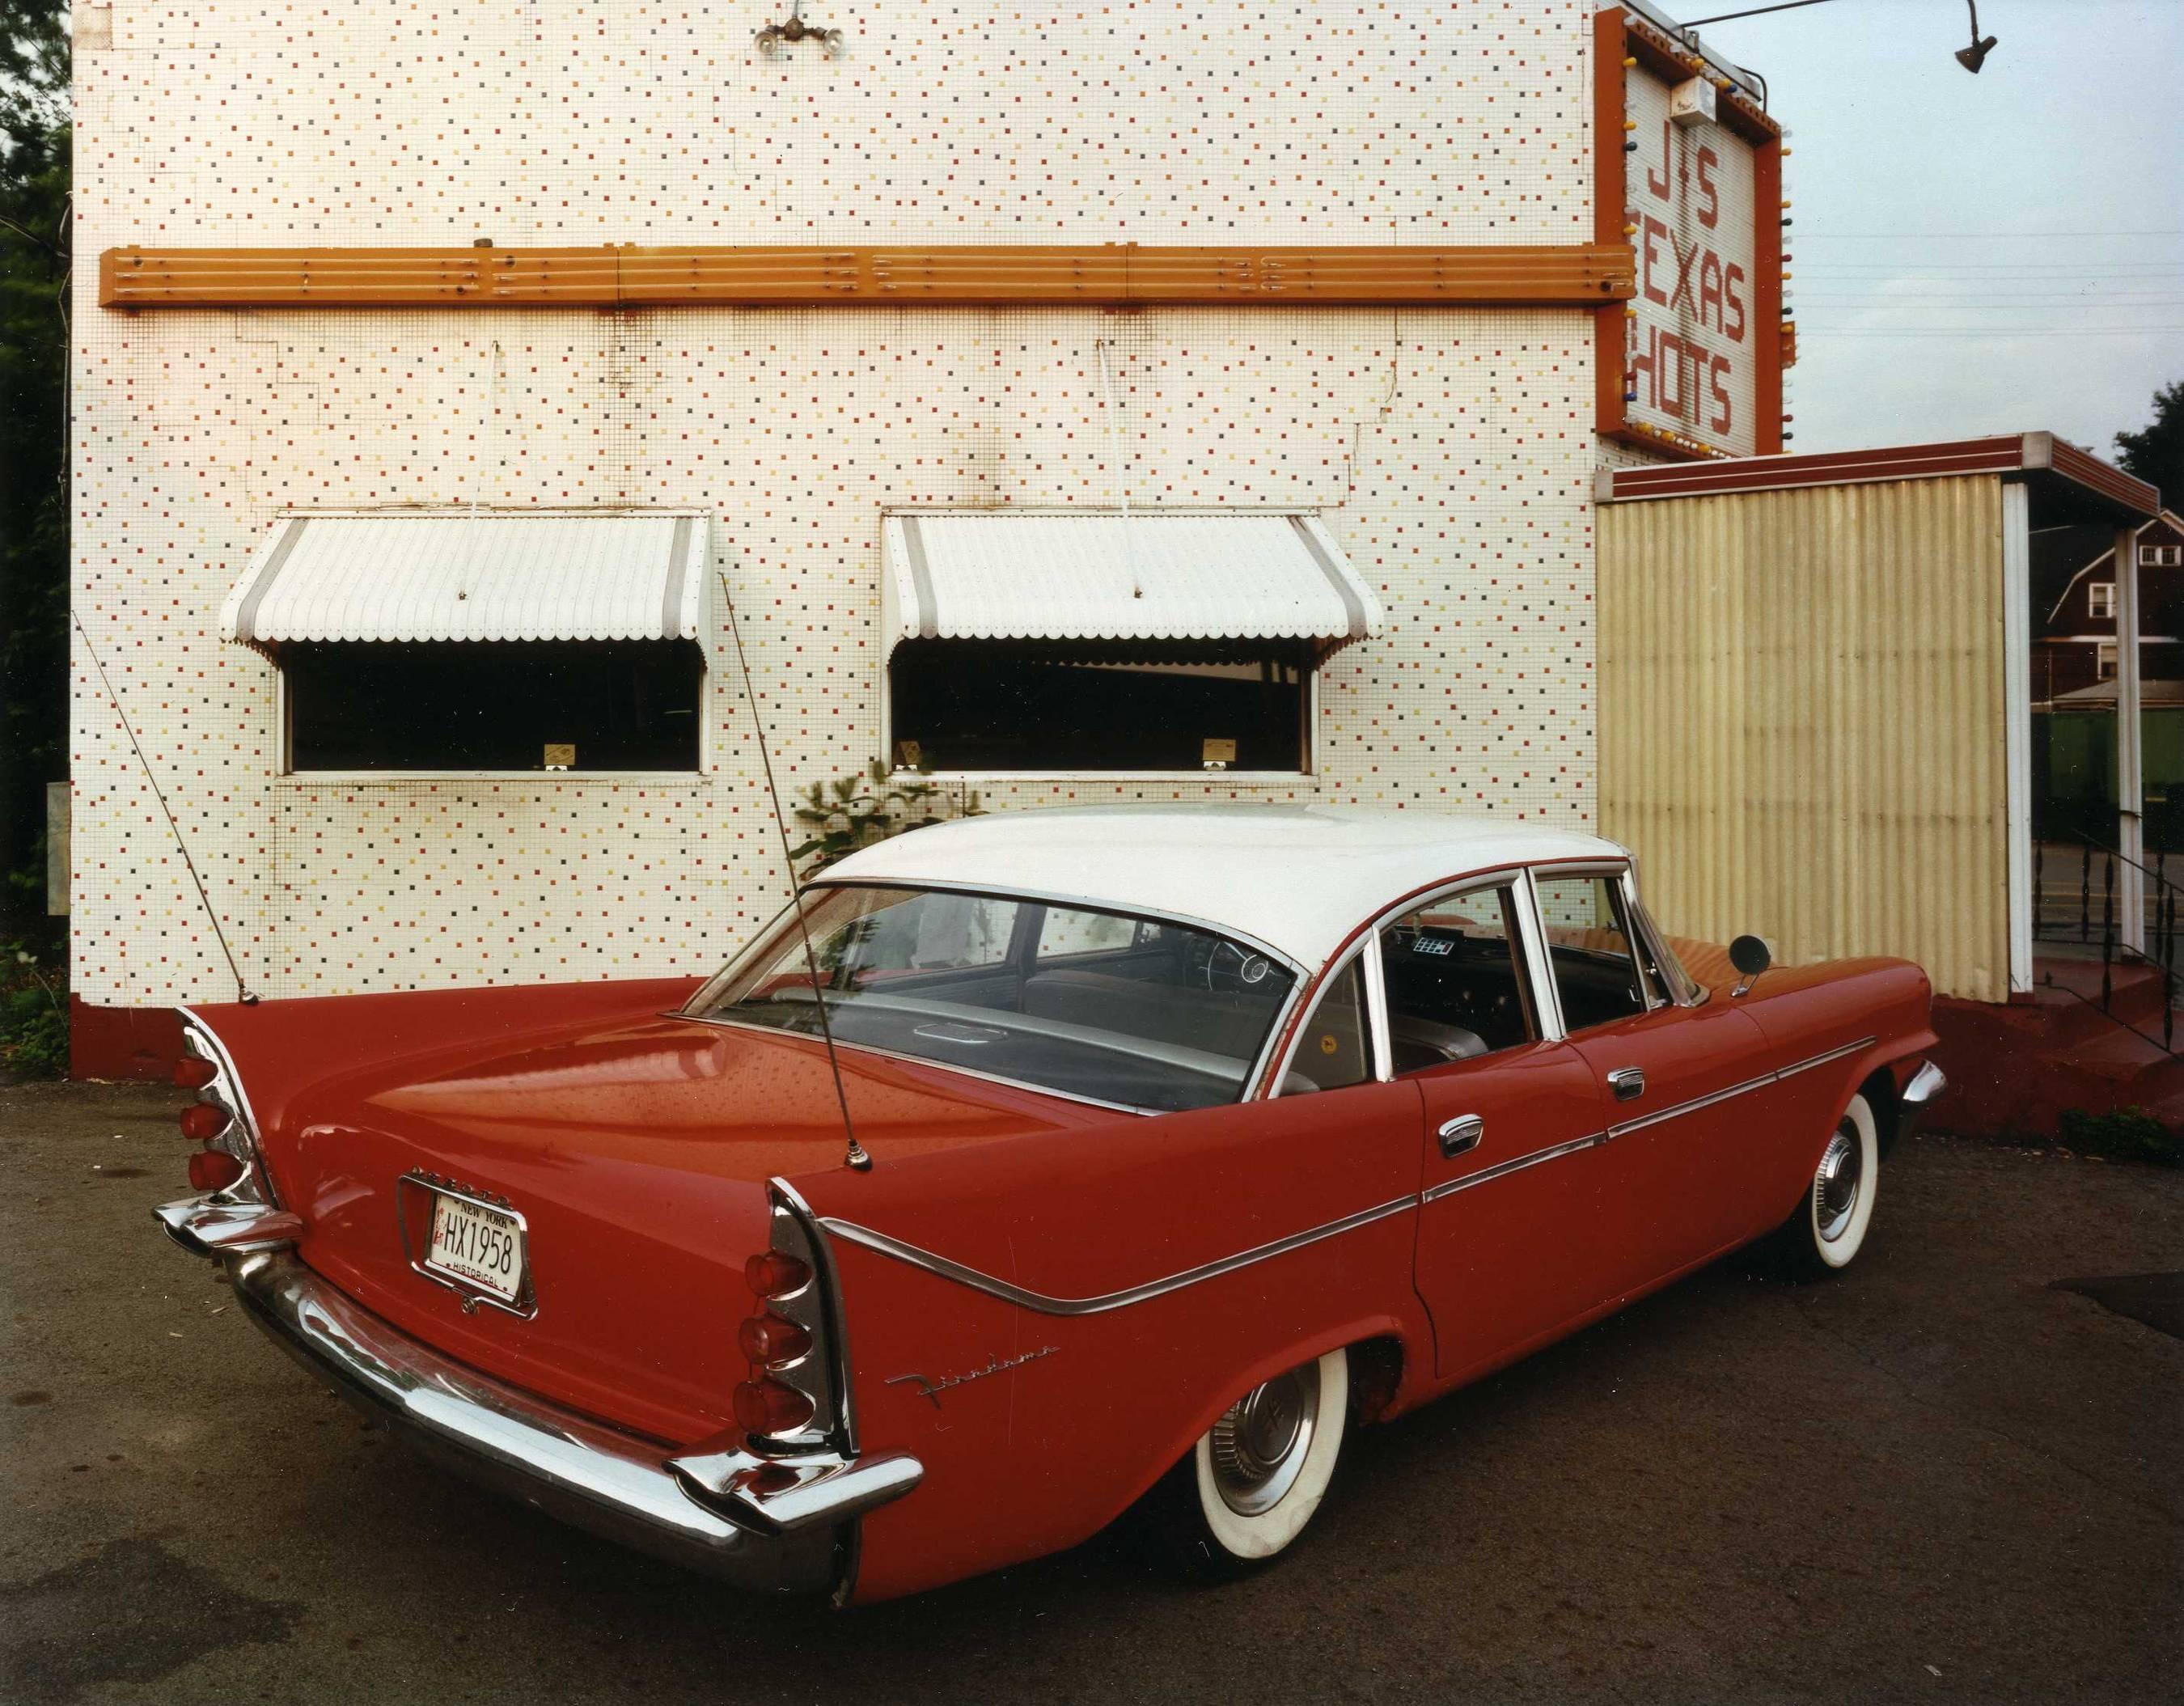 1958 DeSoto Firedome, J & S Texas Hots, near Binghamton, New York